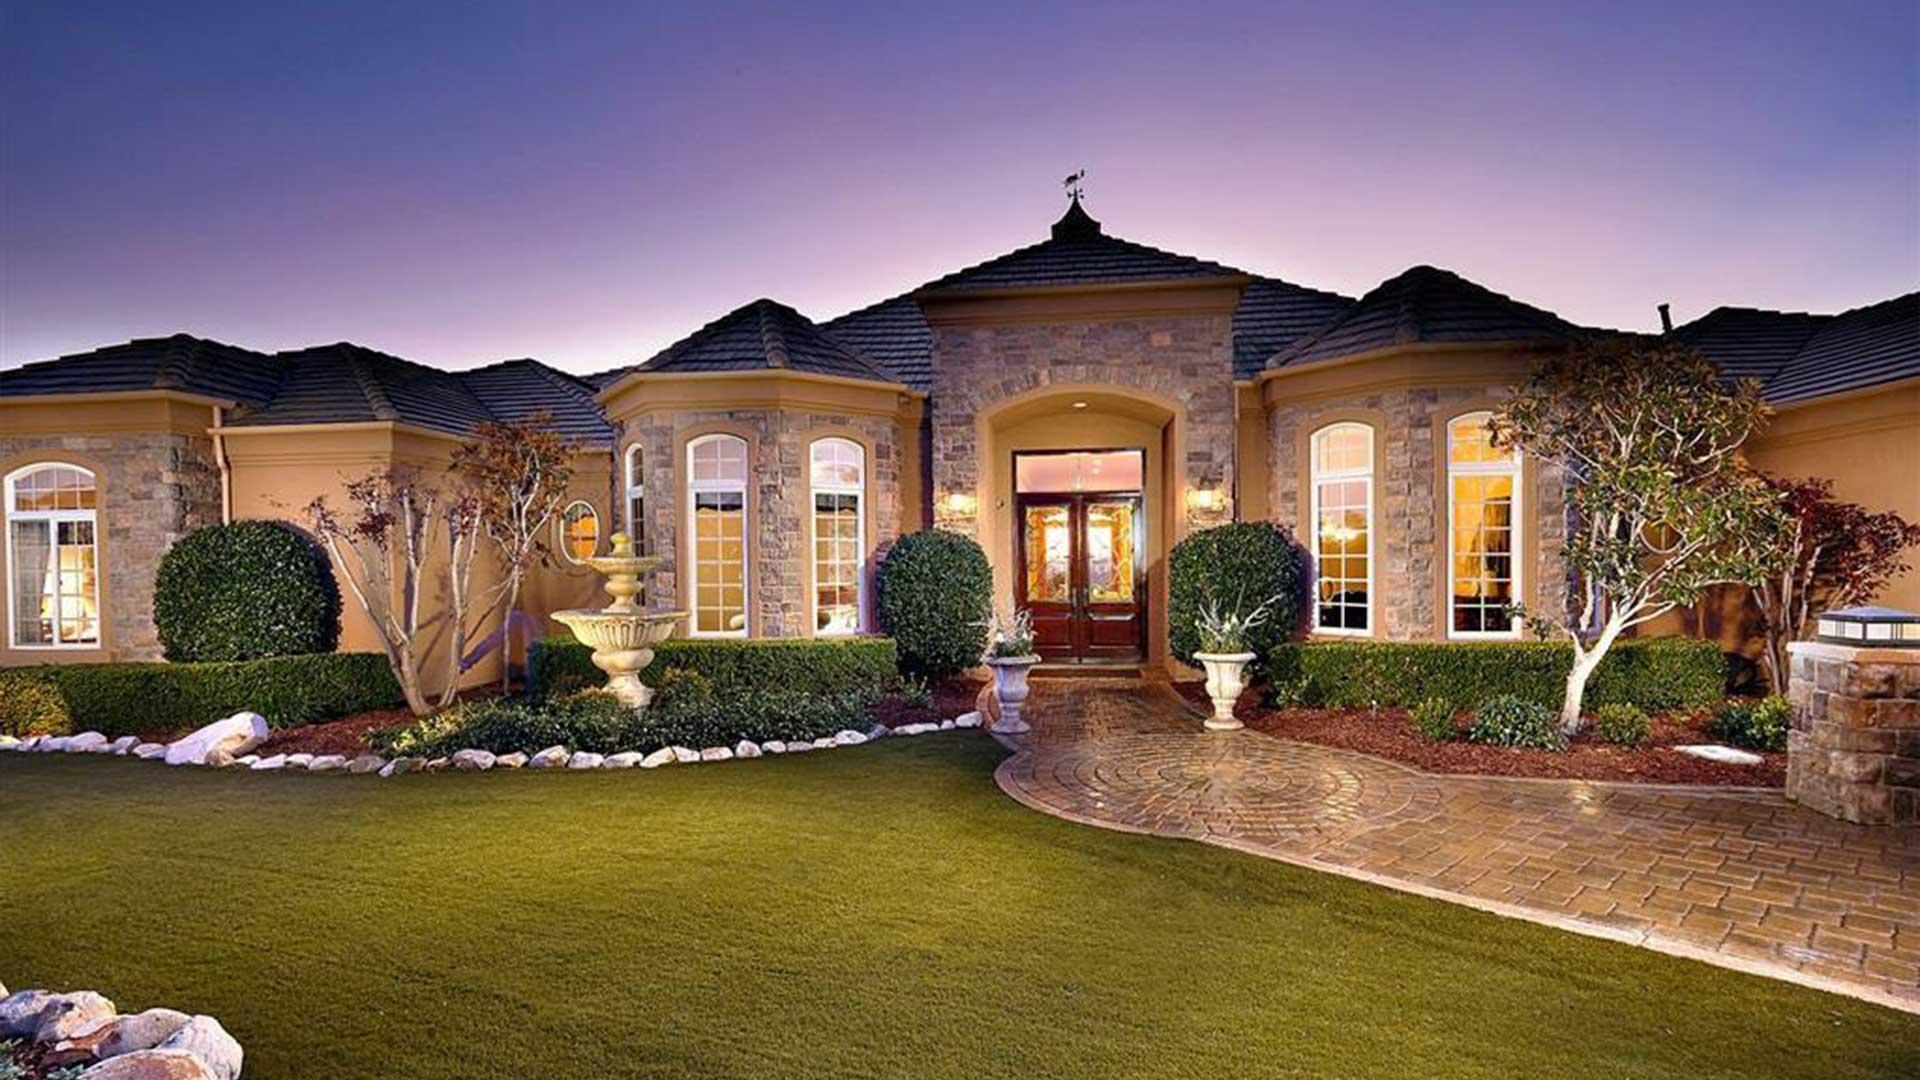 14466 Southern Hills Ln. Poway, CA 92064